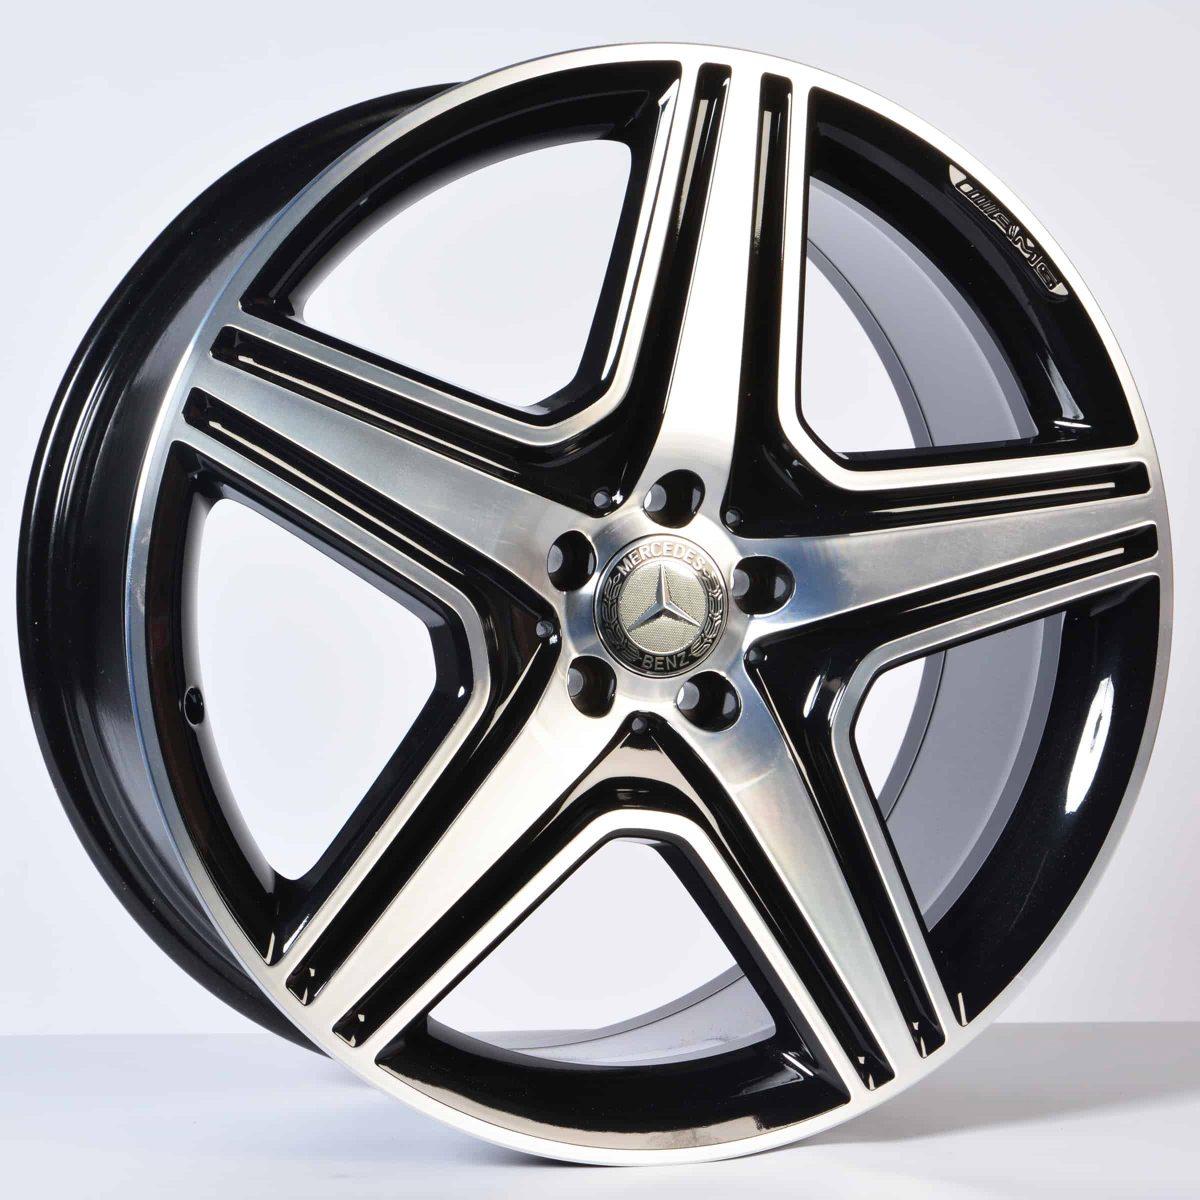 "Genuine Mercedes-Benz ML GLE W166 AMG 21"" inch Star Spoke Alloy Wheels with Gloss Black & Diamond Turned Finish A1644015302"